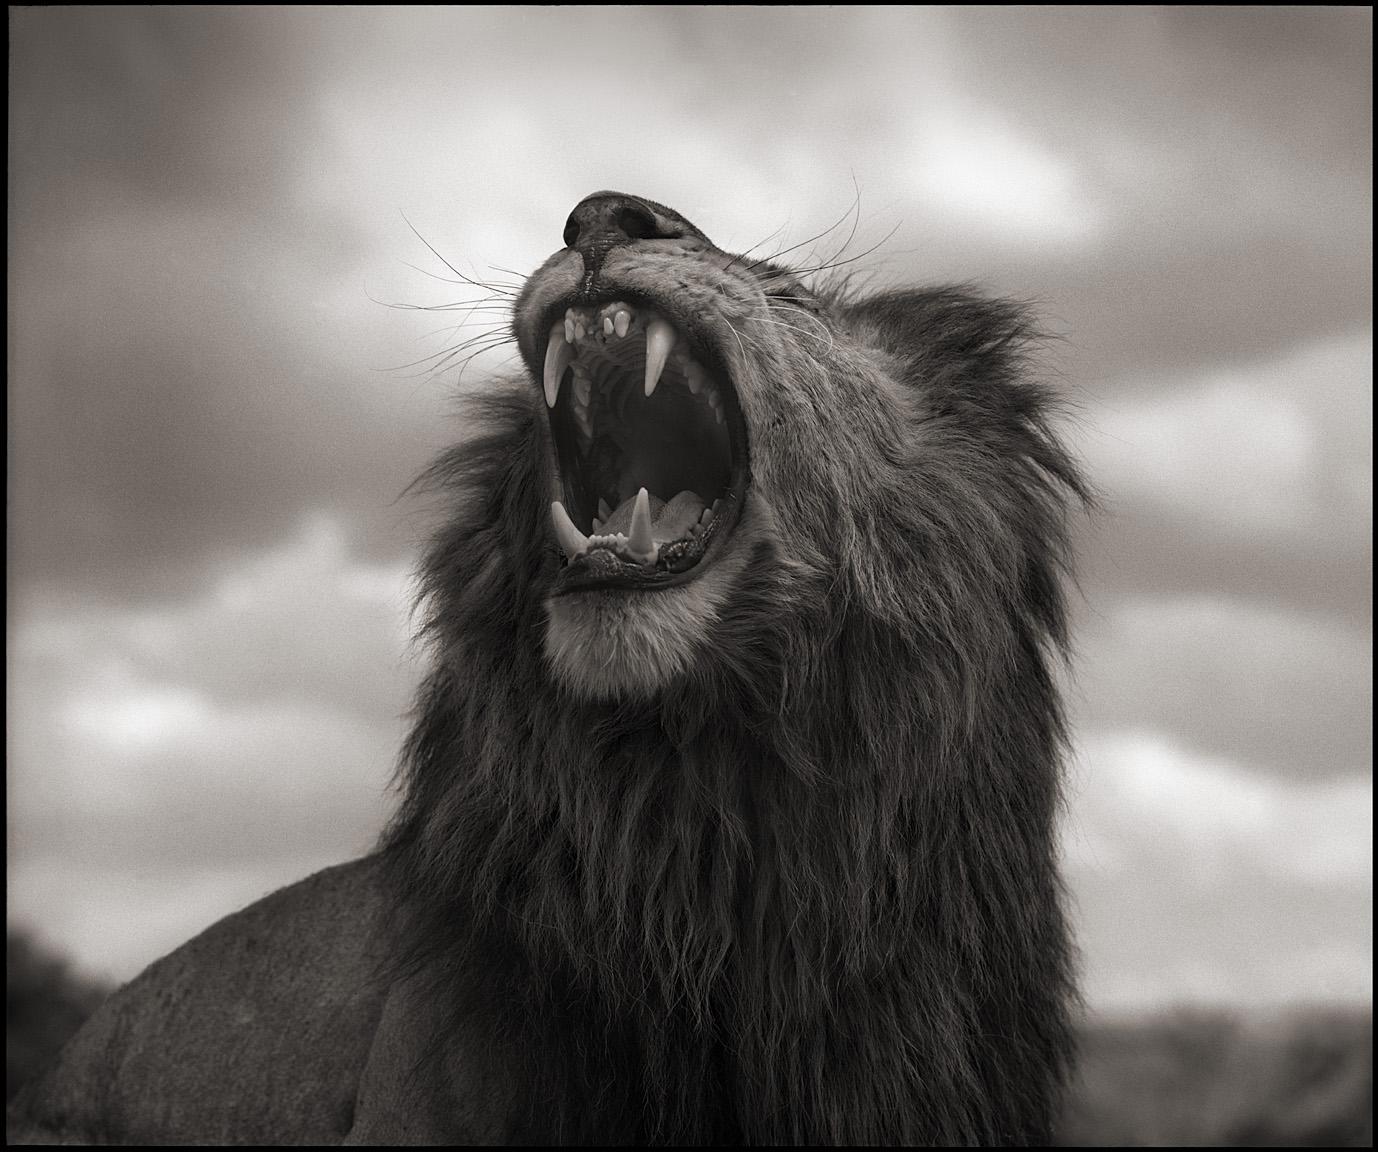 © Nick Brandt, Lion Roar, Maasai Mara, 2012. Courtesy of the Artist and Hasted Kraeutler, NYC.